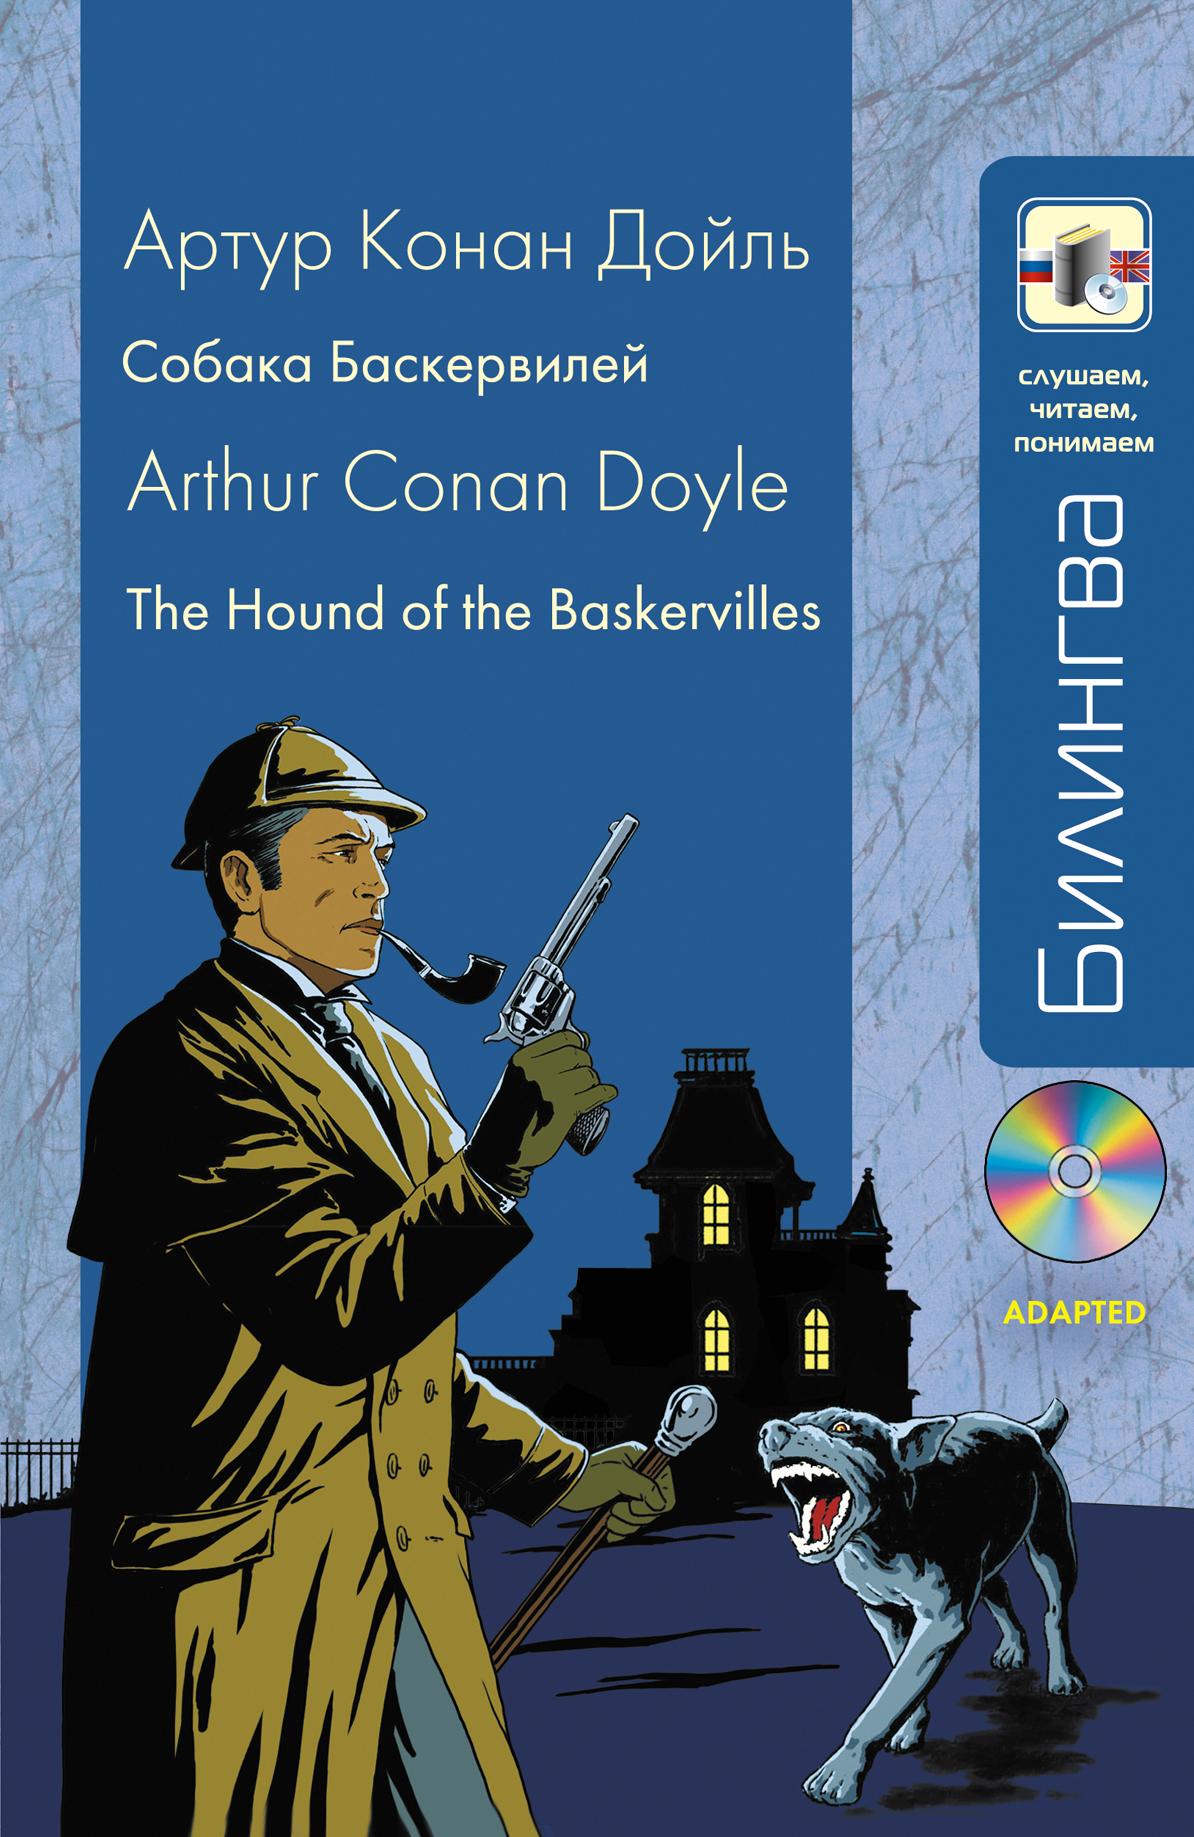 Собака Баскервилей: в адаптации (+СD) ( Конан Дойл А.  )